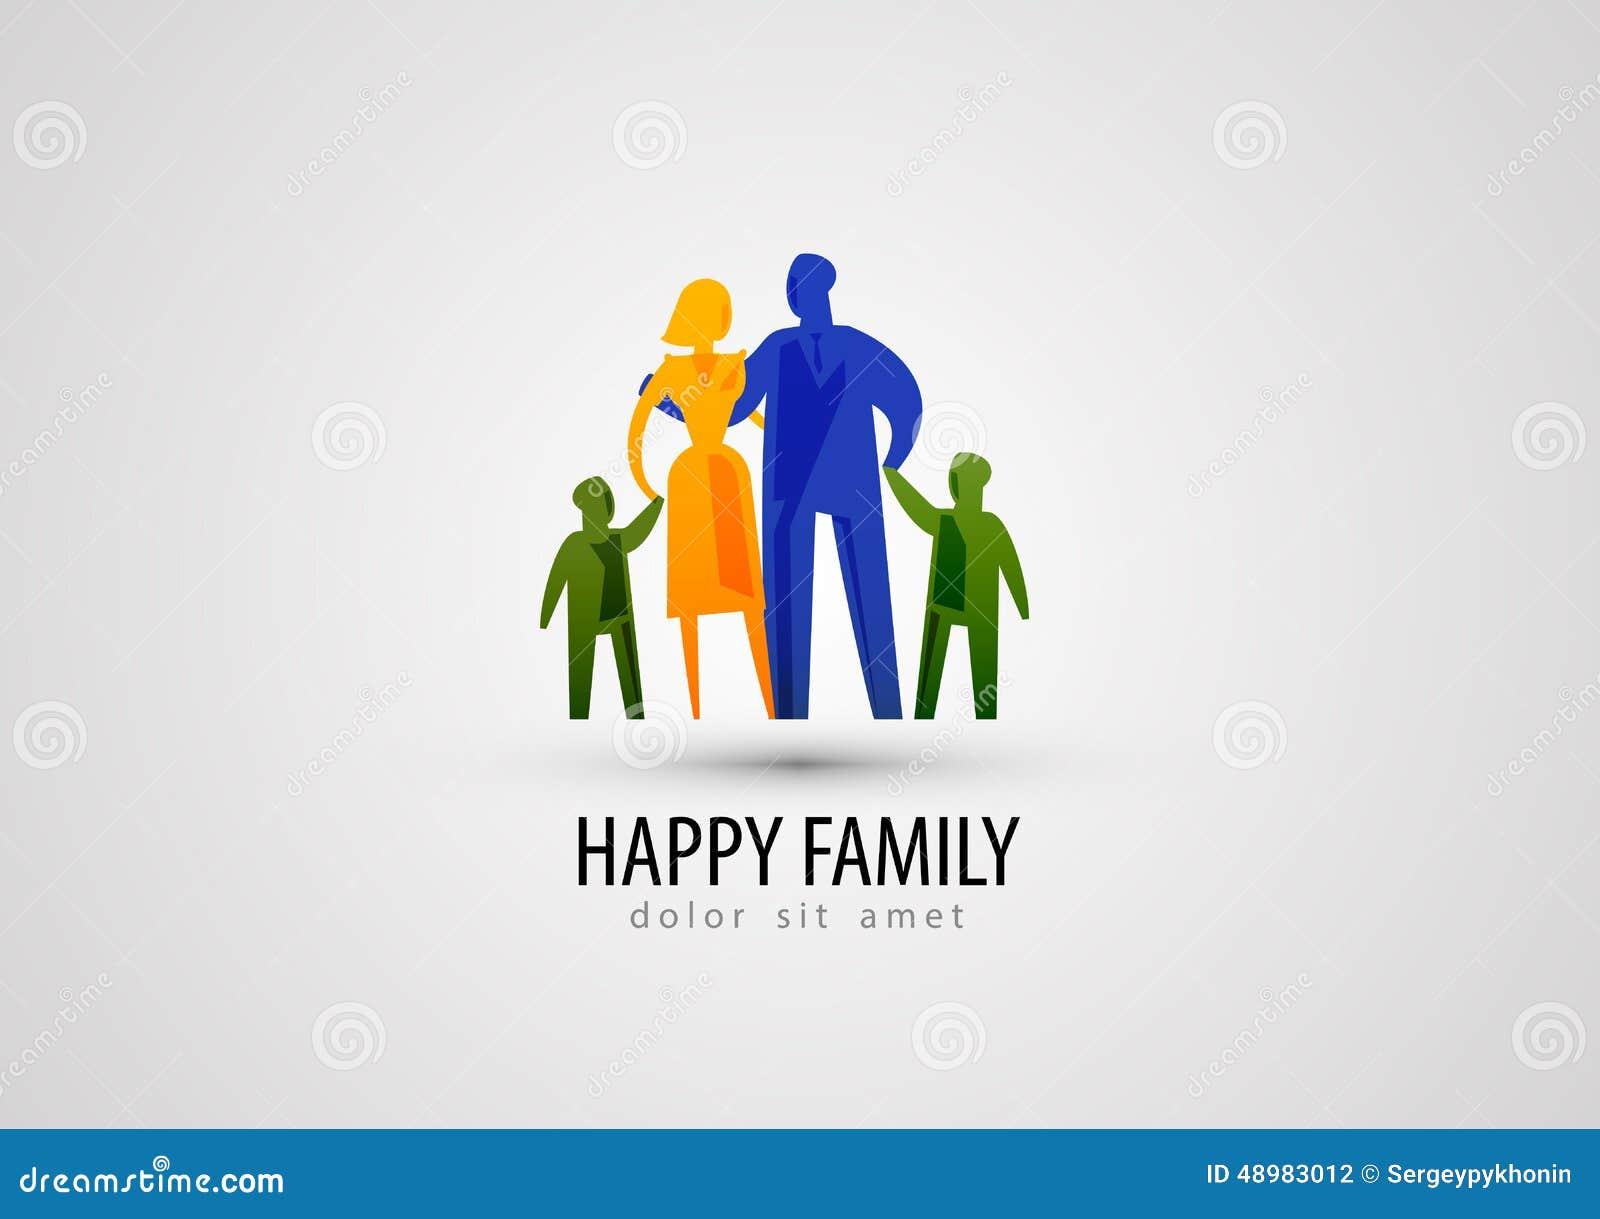 Family Logo Design   www.imgkid.com - The Image Kid Has It!